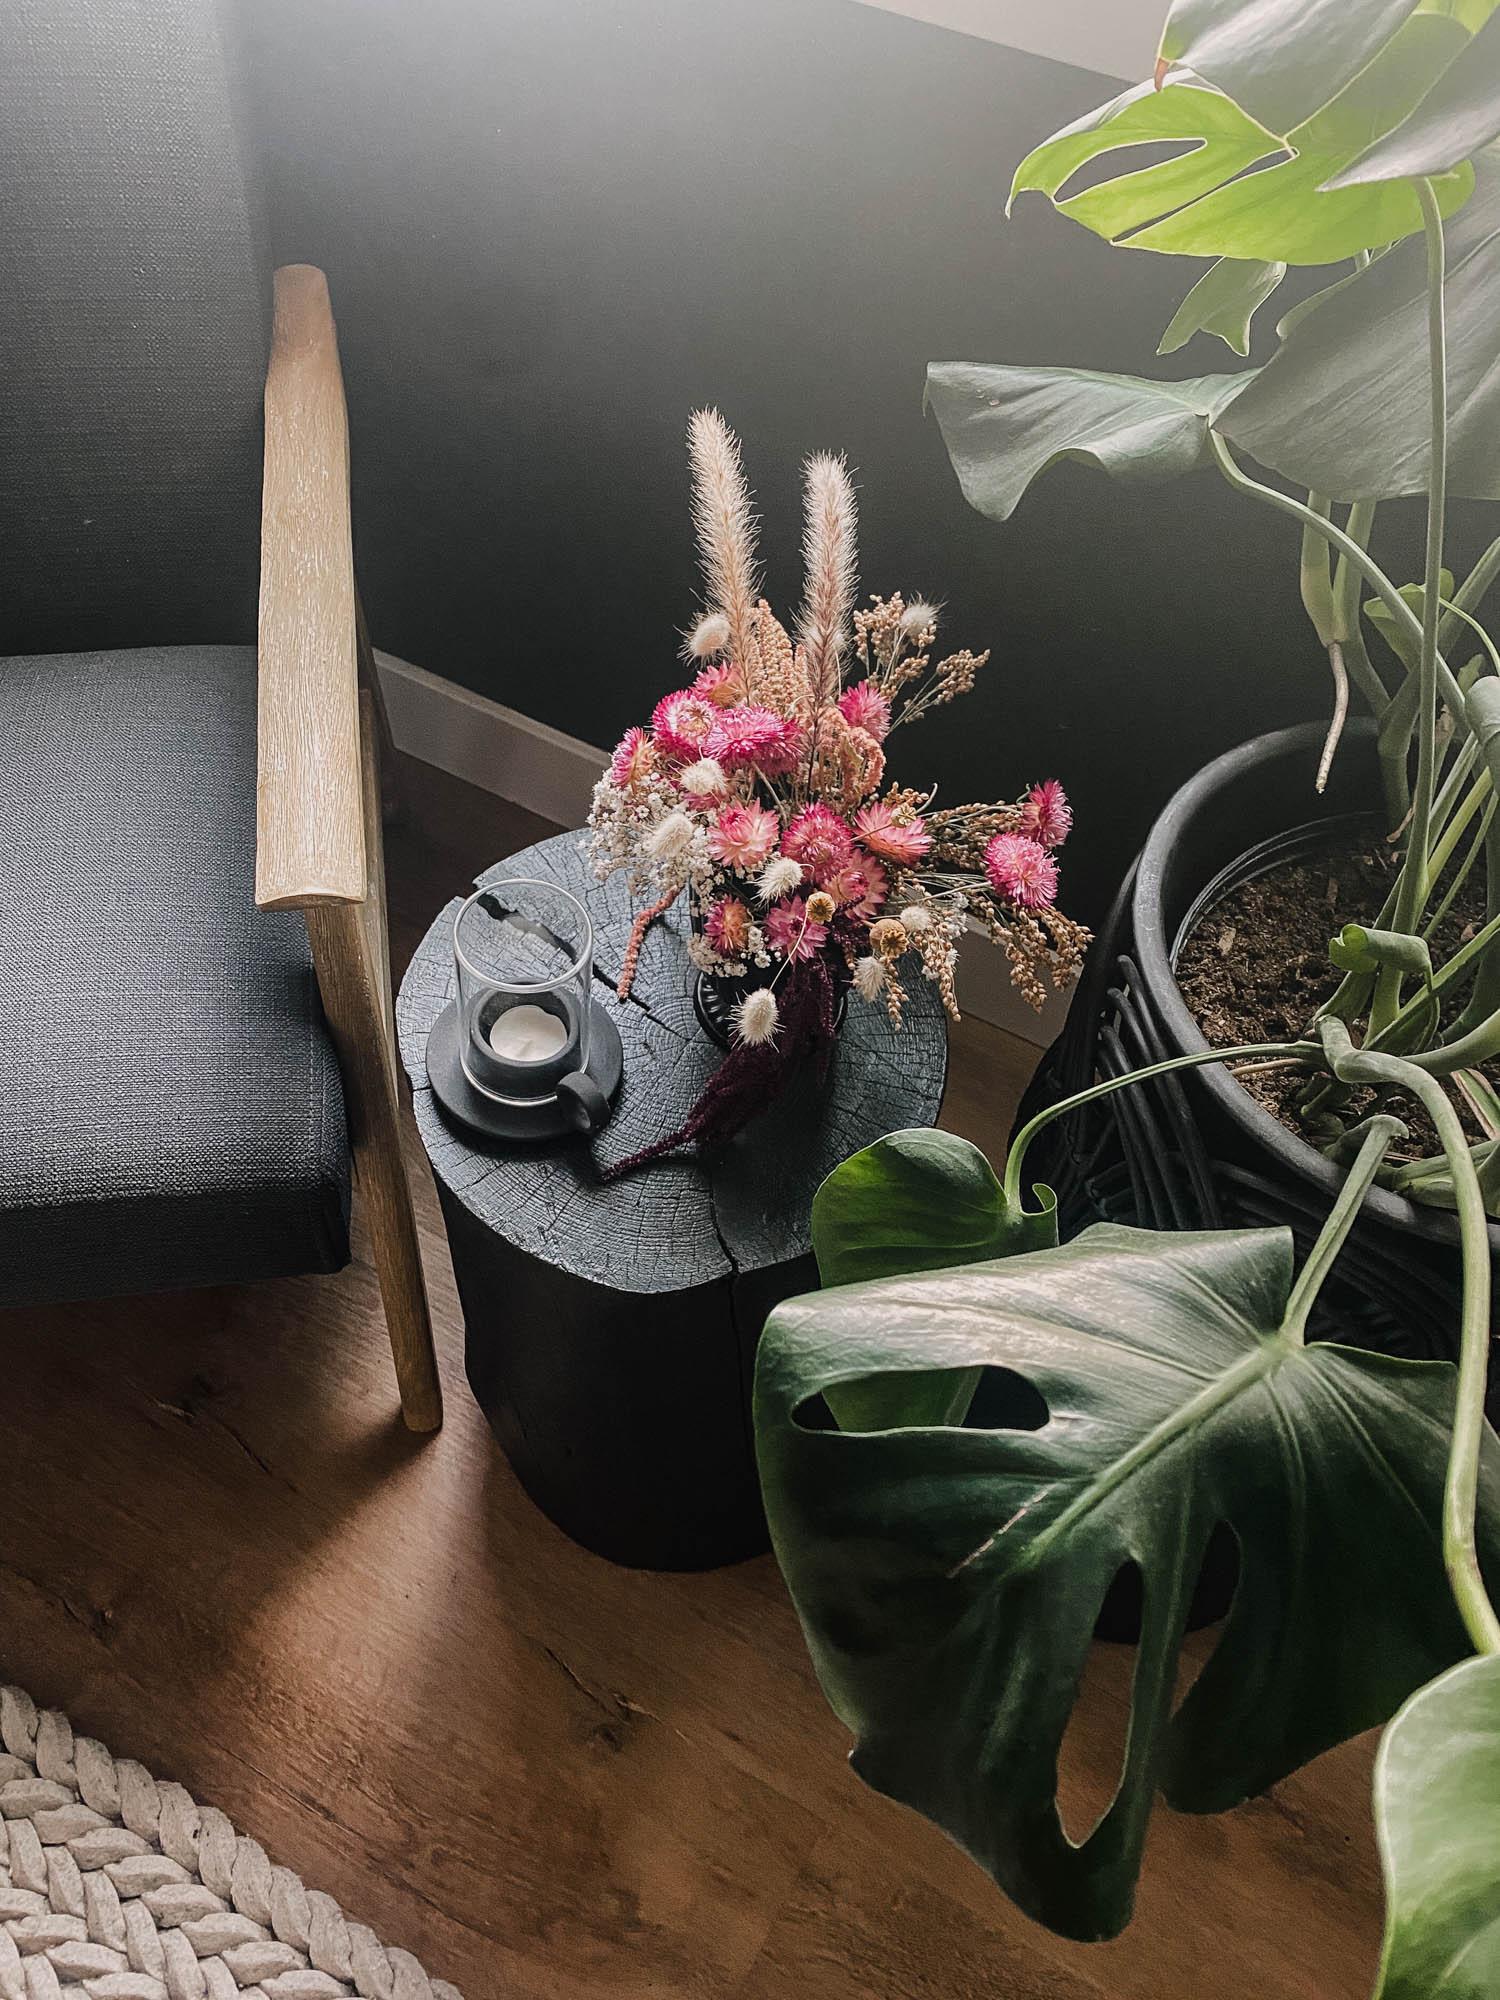 dried floral arrangement on stump table